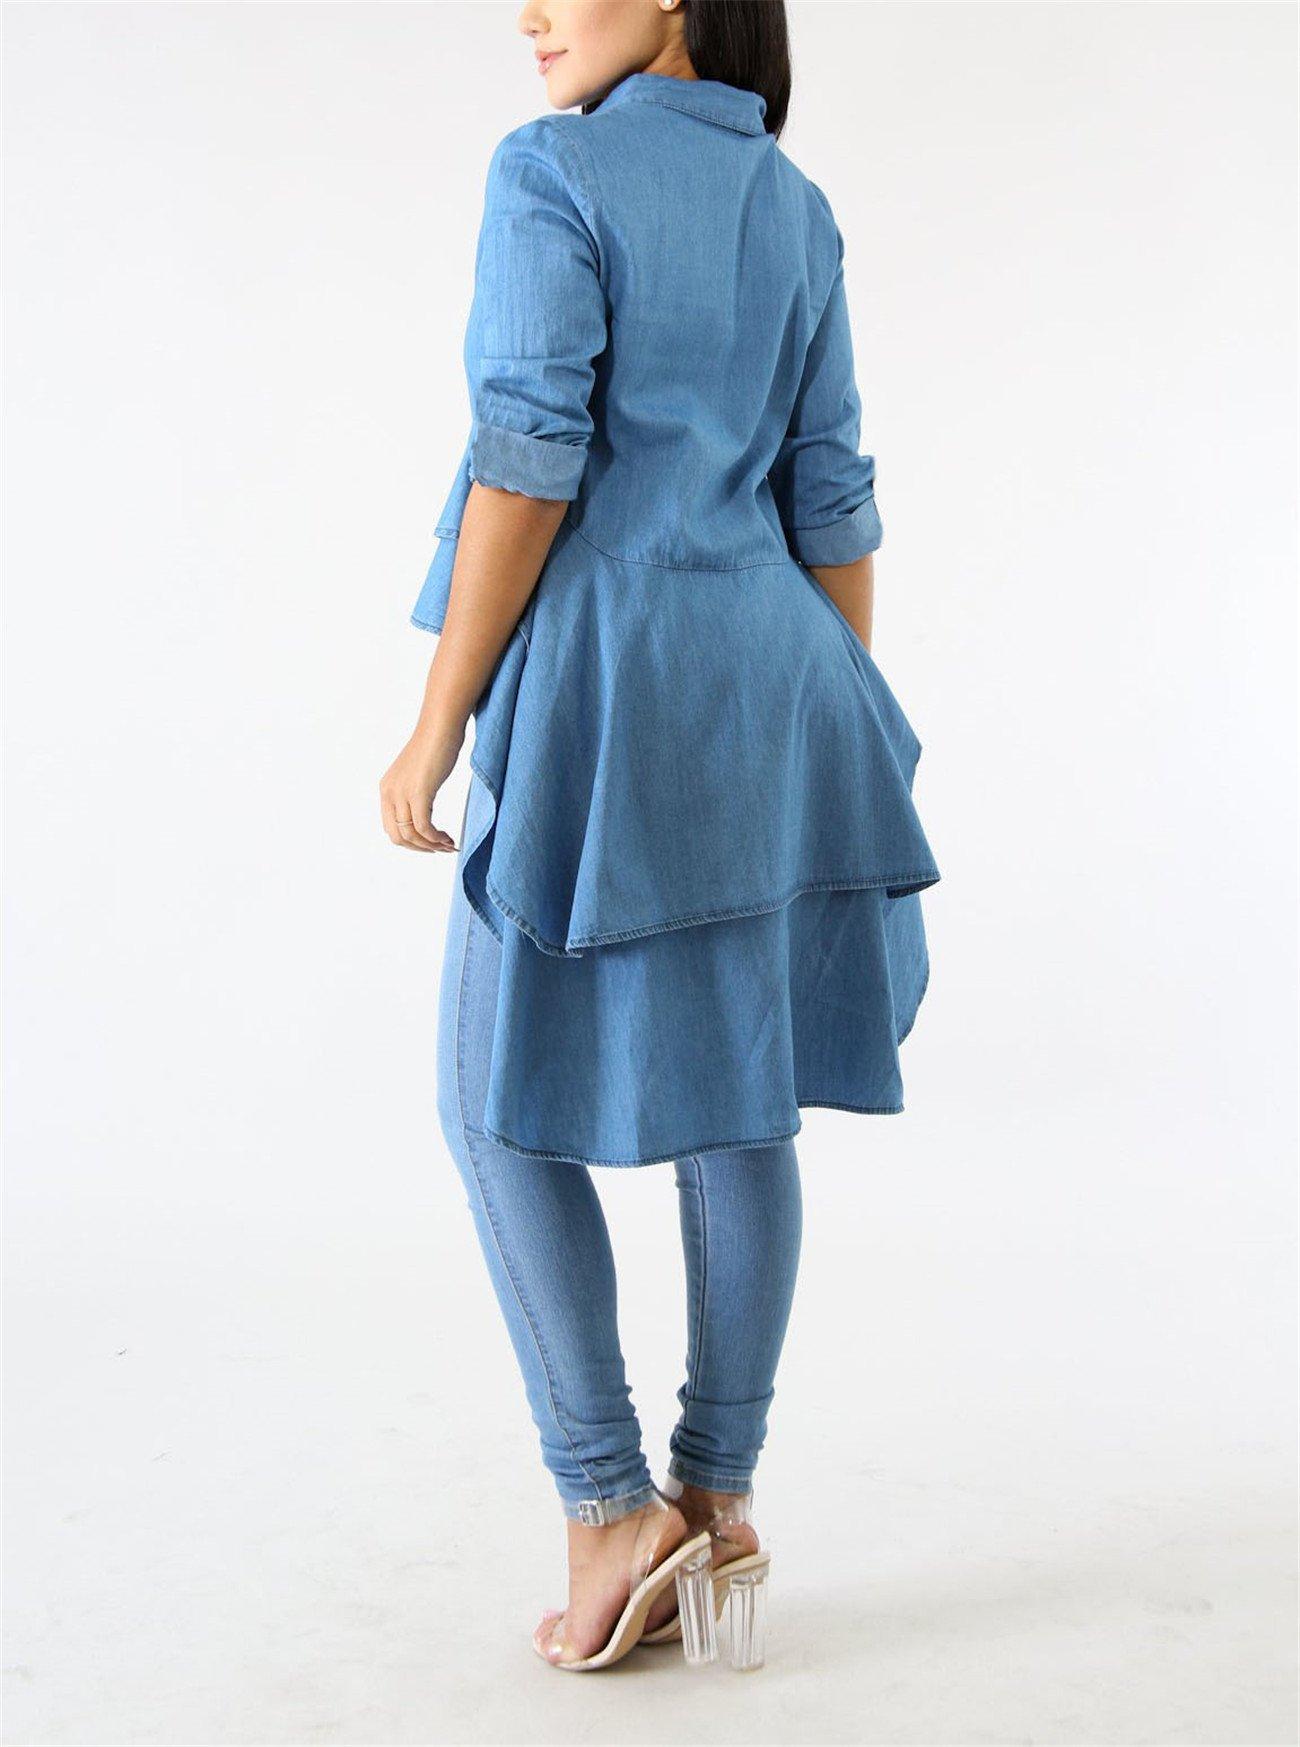 Fashion Cluster Womens Summer Long Sleeve Denim Blue Irregular High Low Hem Buttom Down Tunic Tops Blouse Boho Maxi Polo Shirt Dress XXL by Fashion Cluster (Image #5)